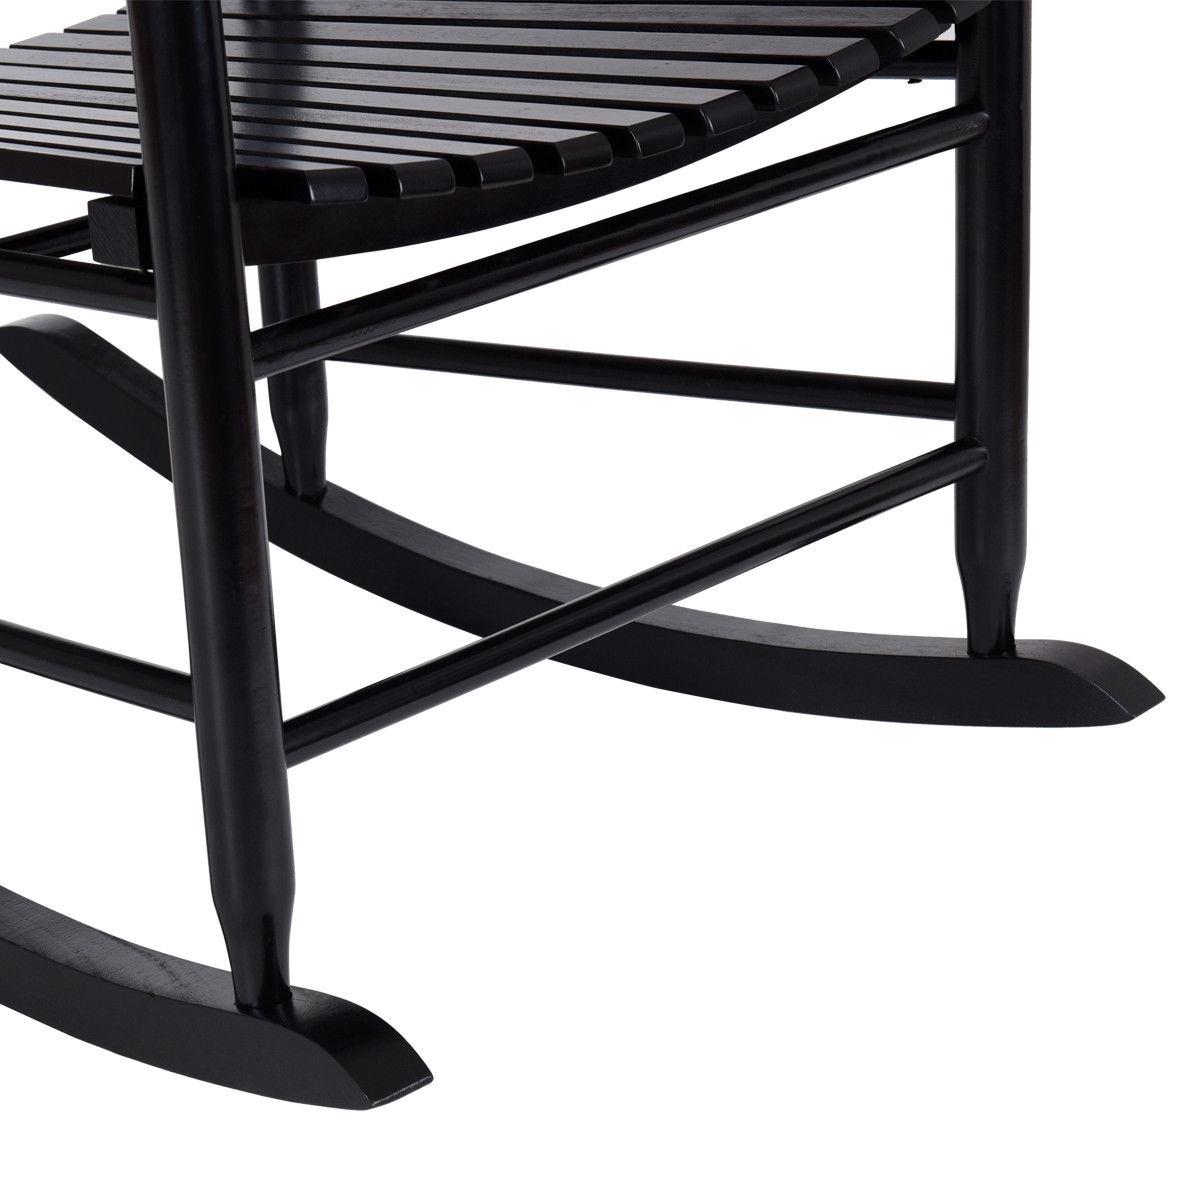 Gymax Wooden Rocking Chair Porch Rocker Armchair Balcony Deck Garden Furniture Black - image 1 of 8